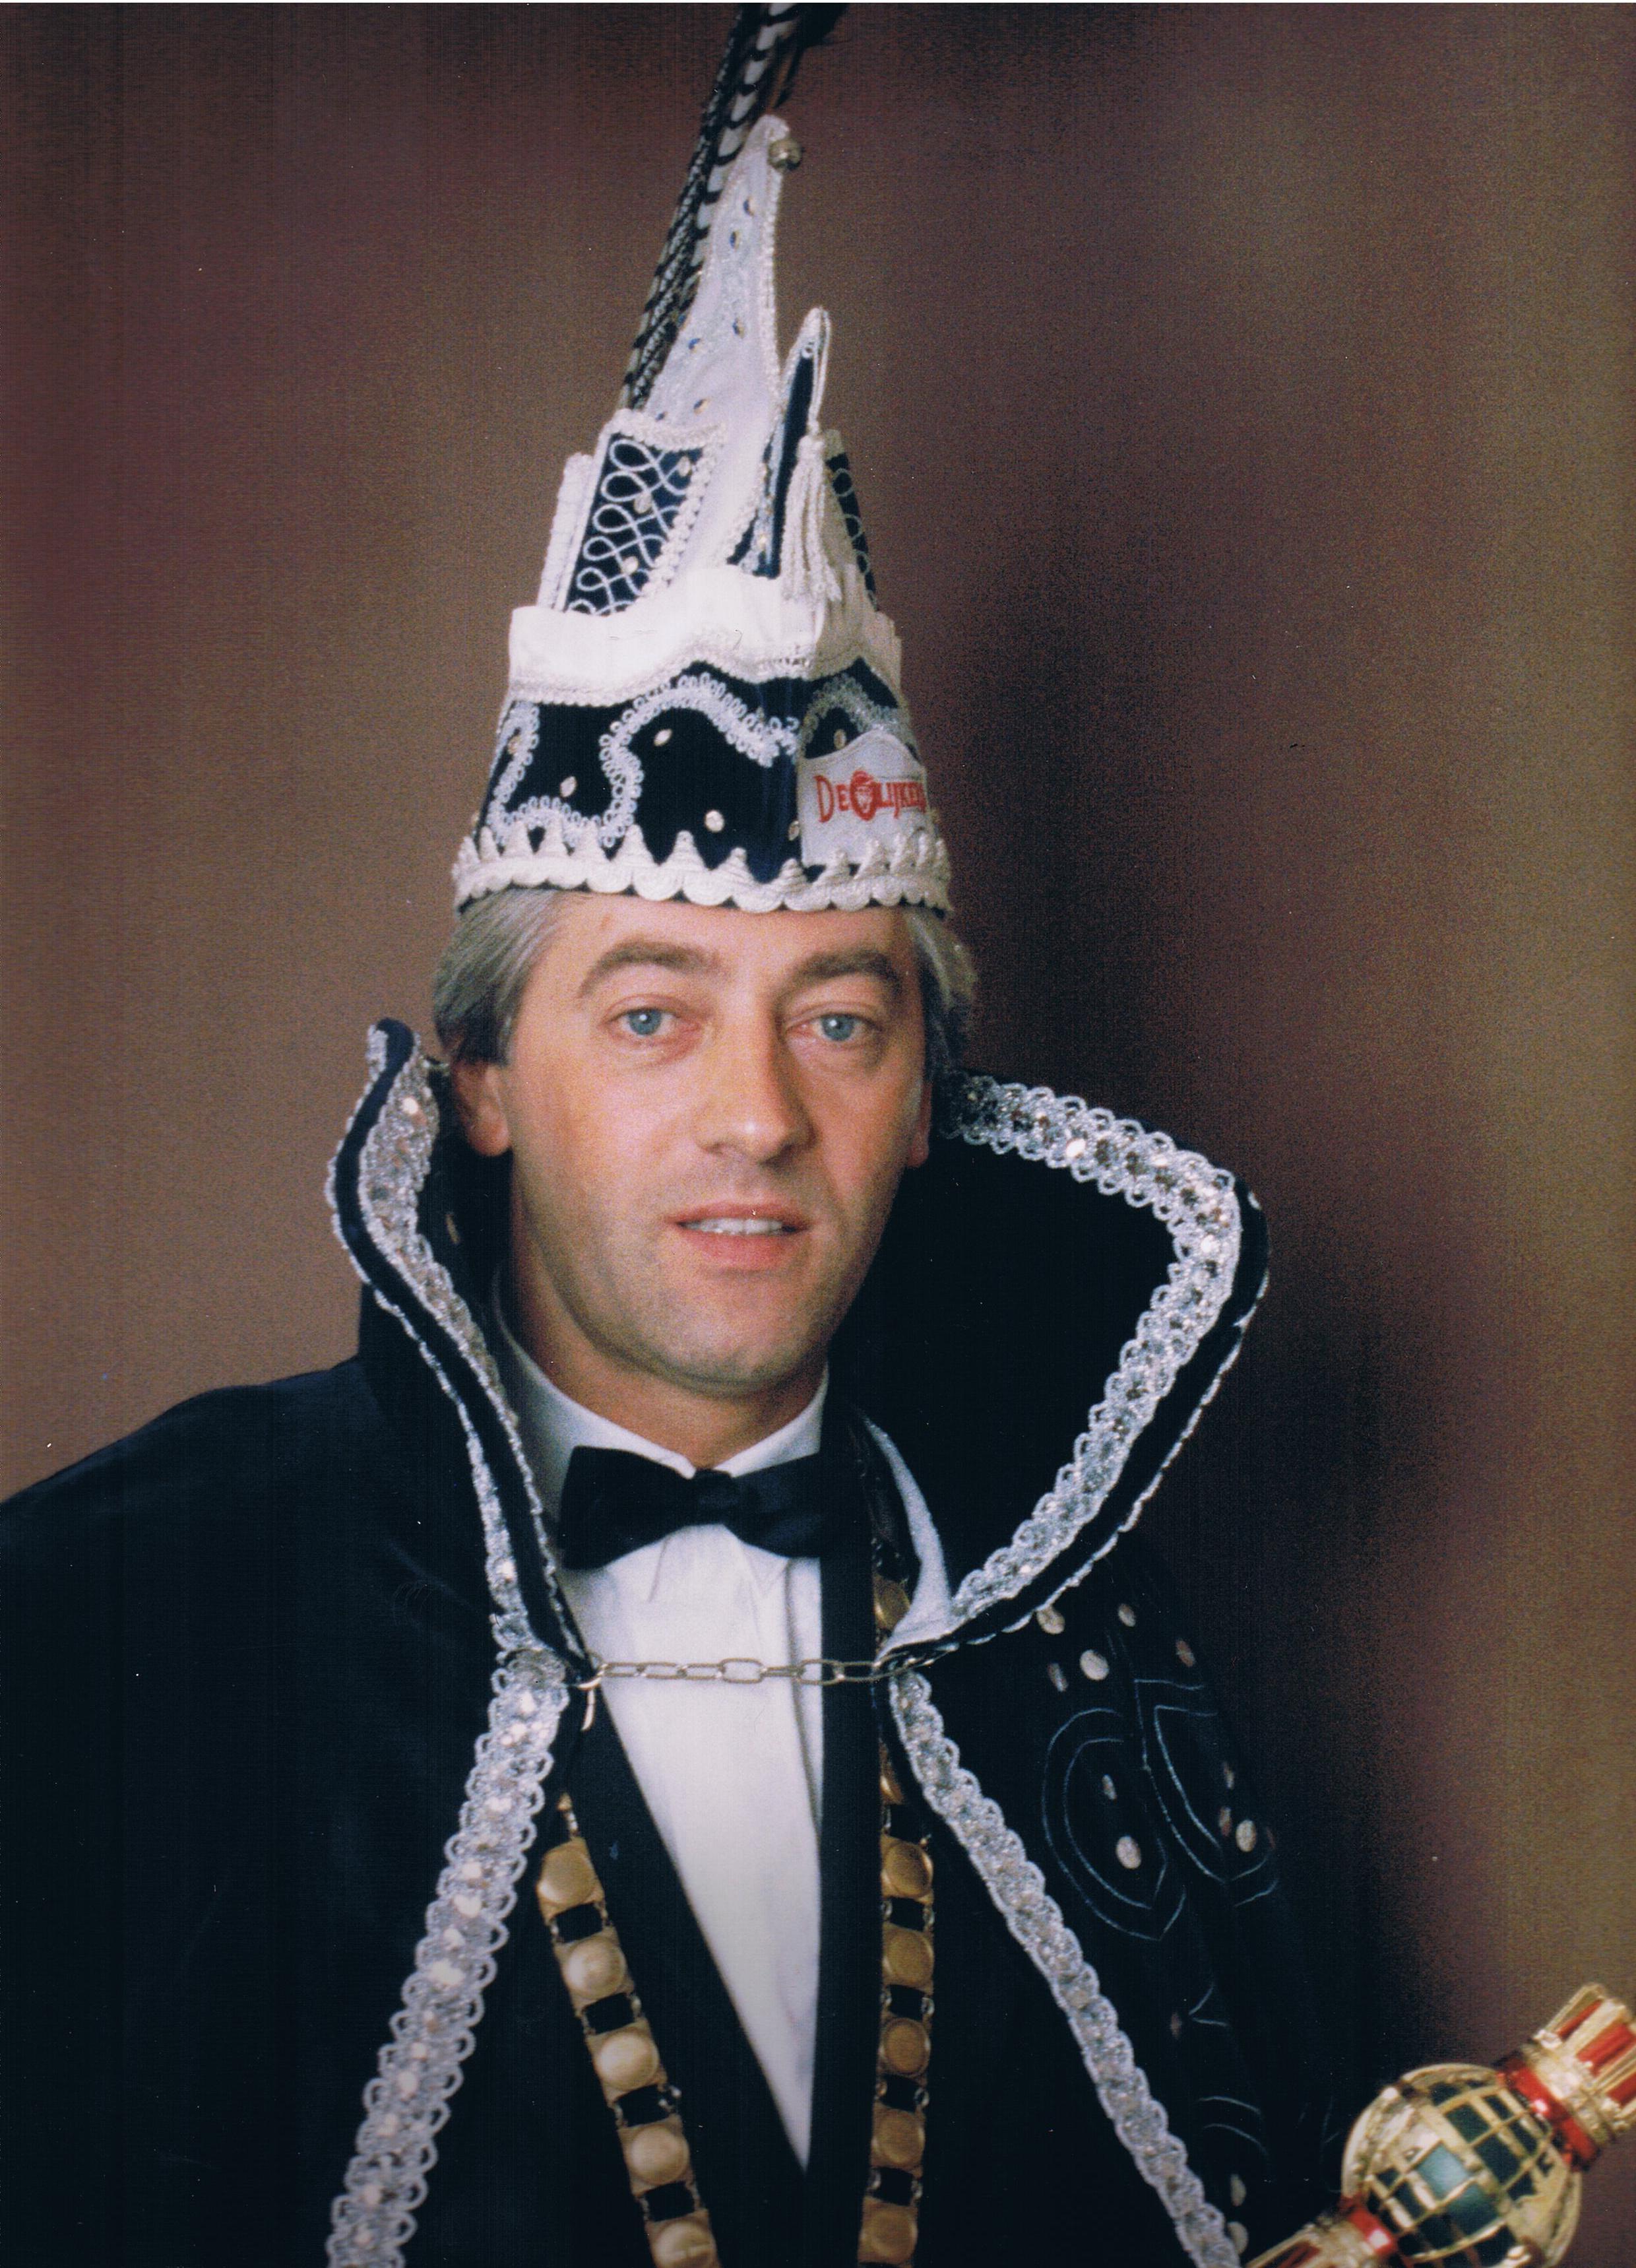 1990 1991 Prins Sjef de 1e Sjef de Poorter